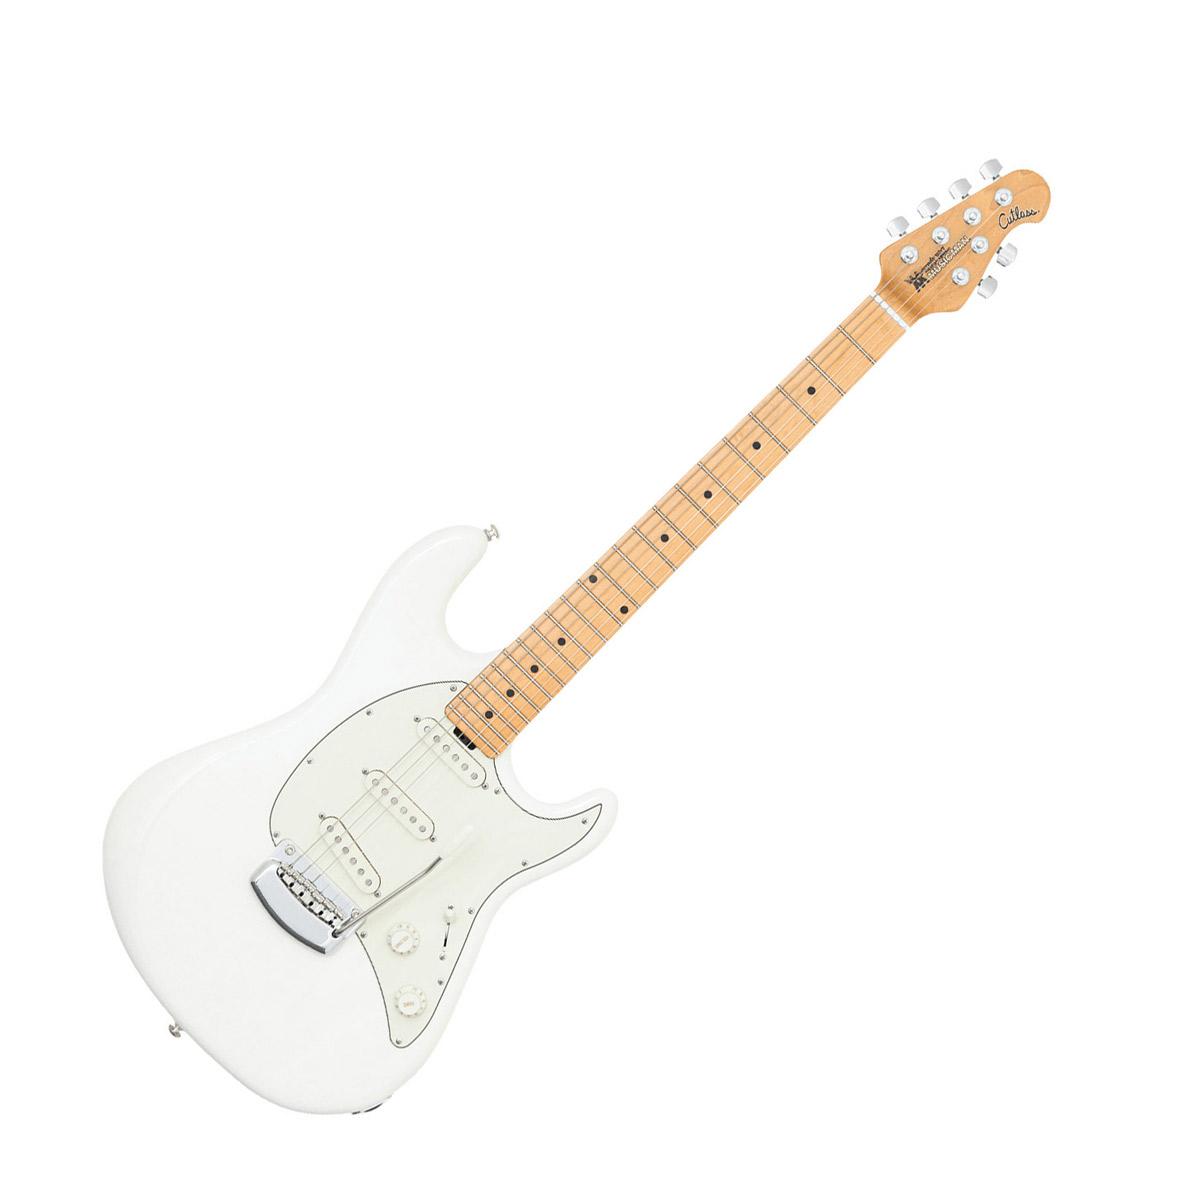 MUSICMAN CUTLASS Ivory White エレキギター 【ミュージックマン】